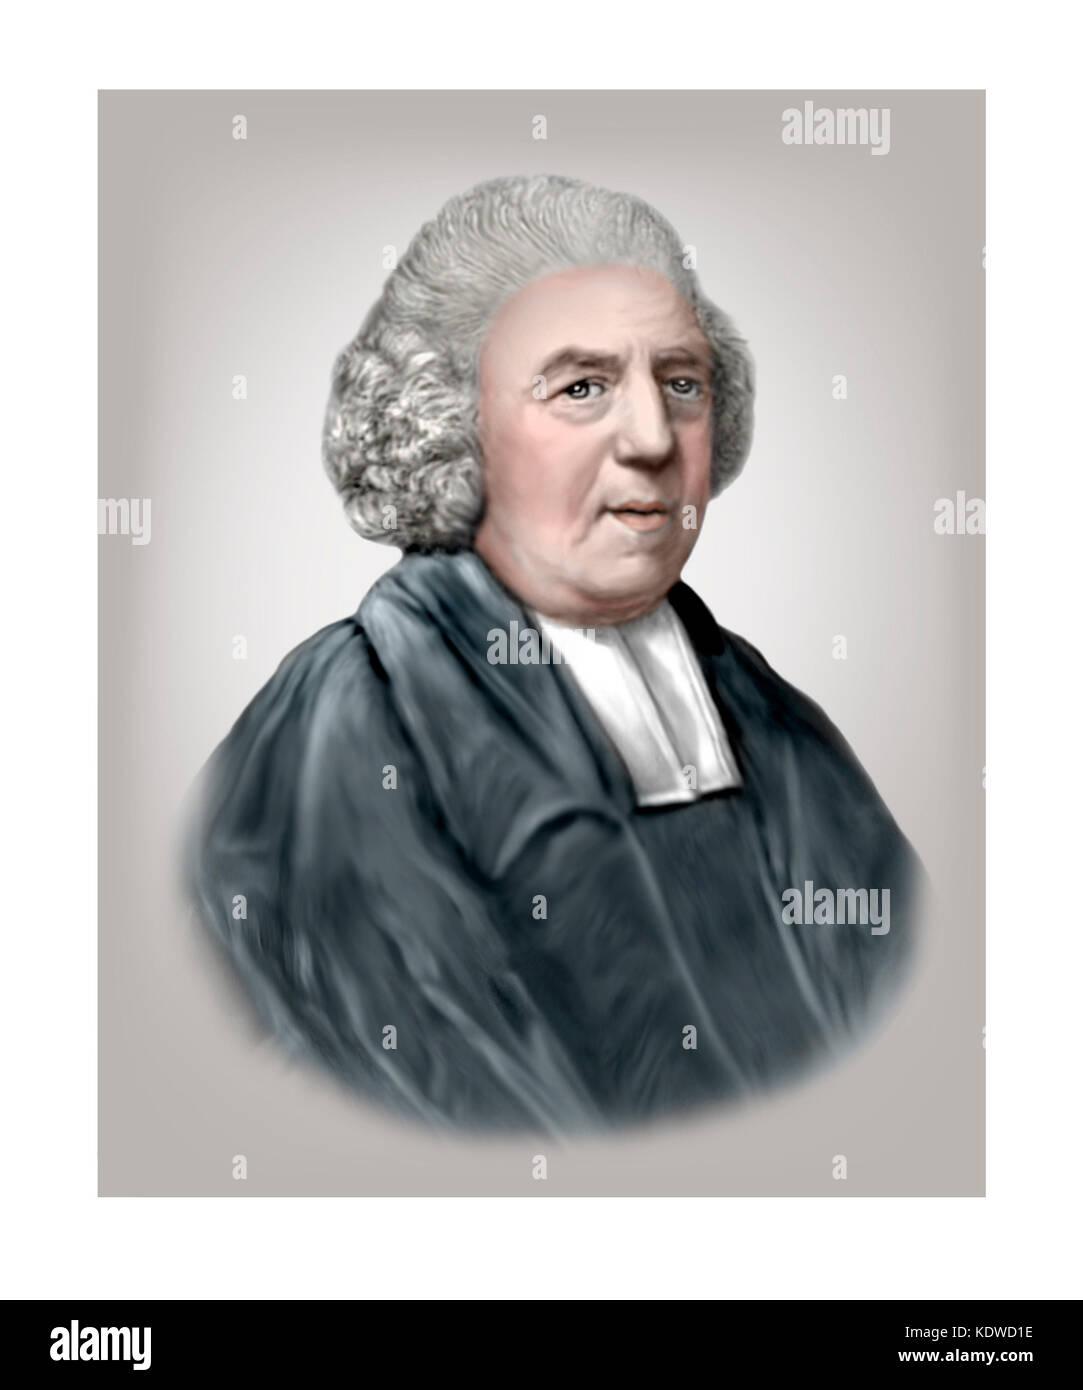 John Newton, 1725 - 1807, Anglican Clergyman - Stock Image